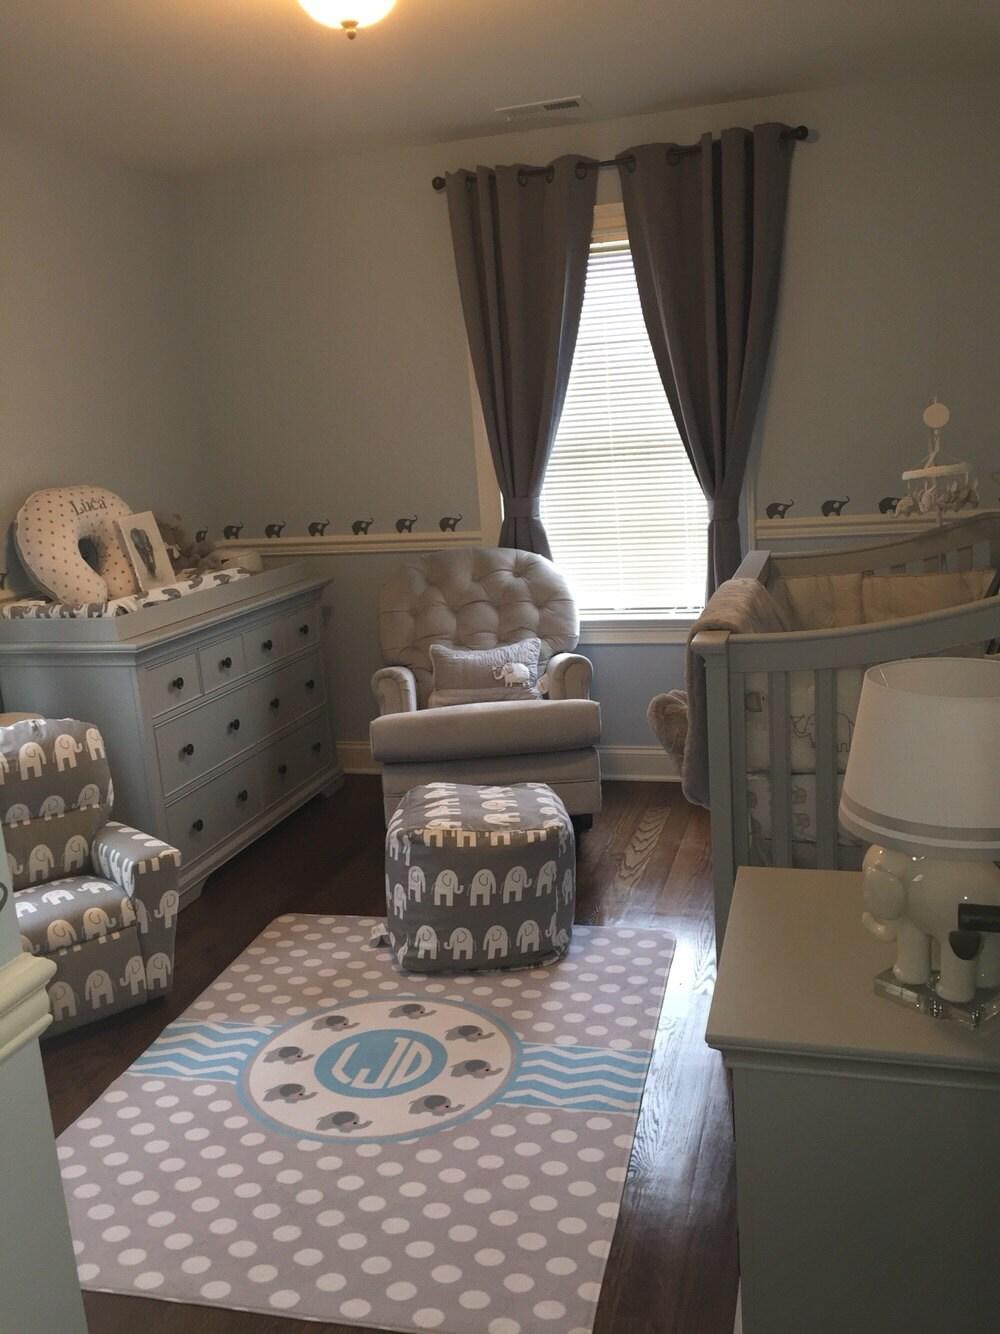 Nursery Elephant Theme Plush Fuzzy Area Rug Grey Polka Dots